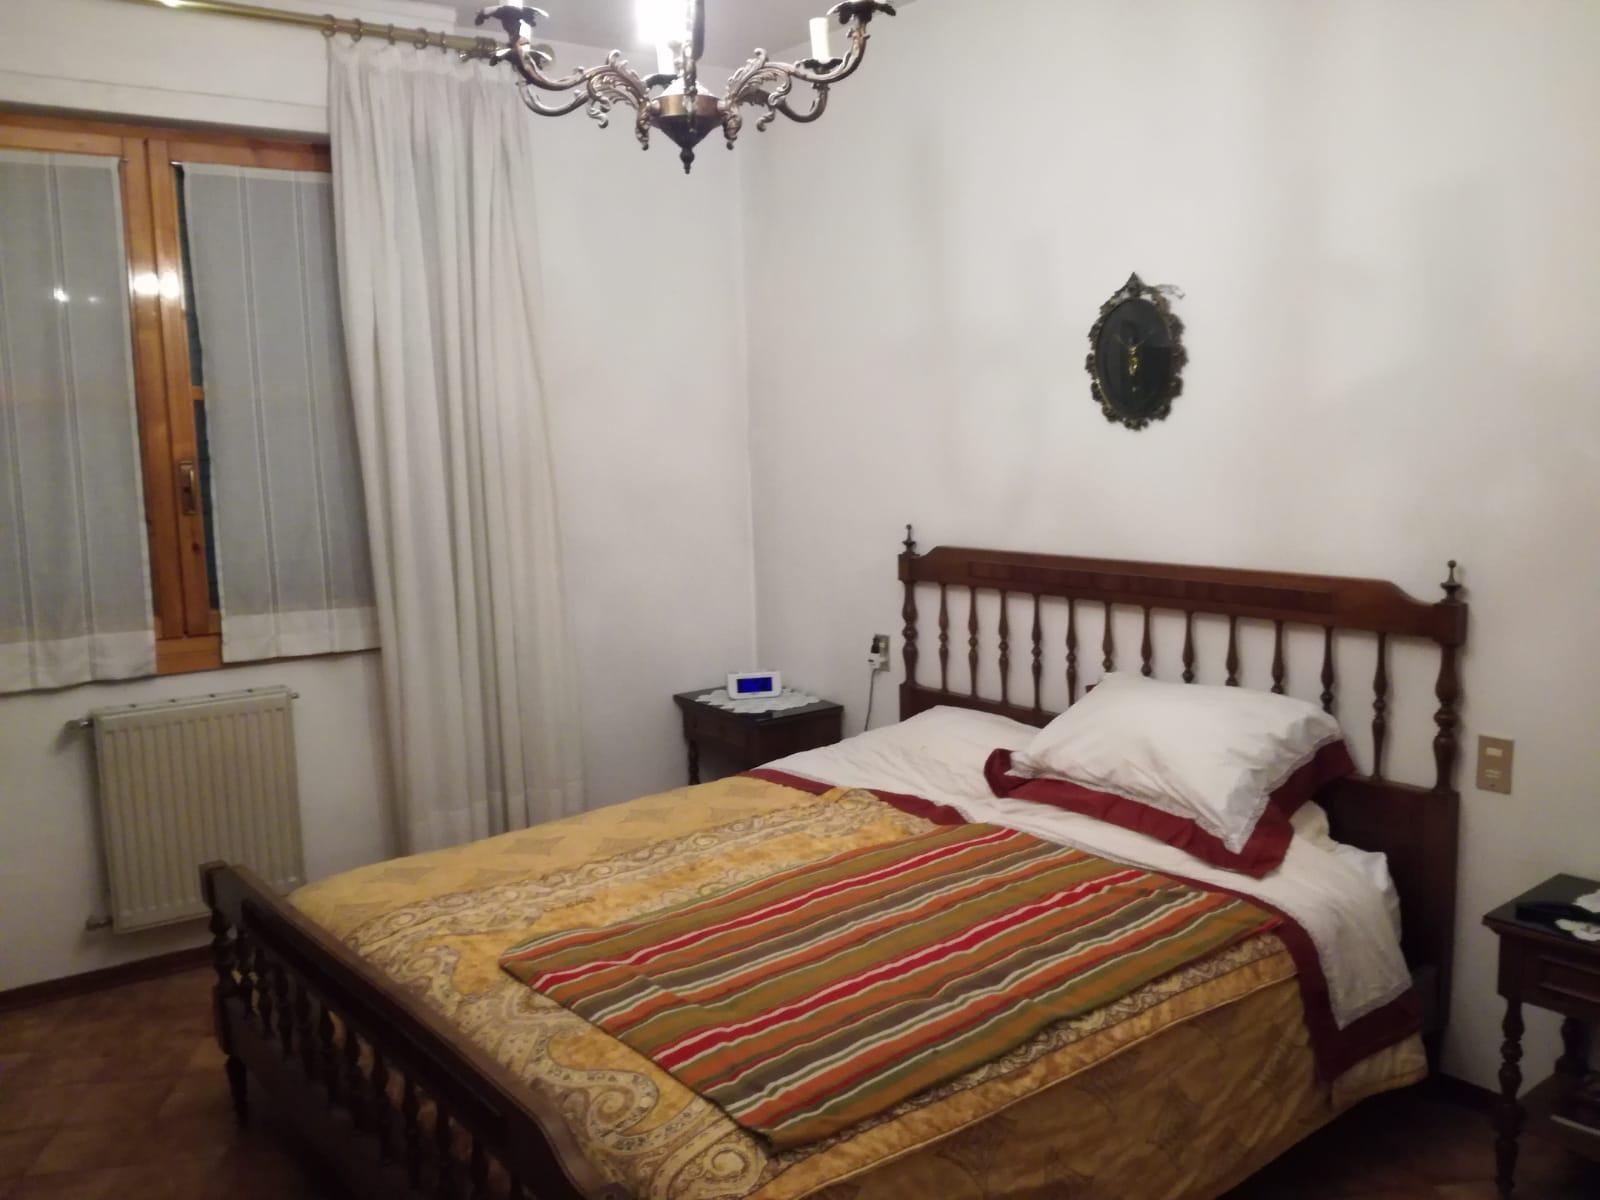 VIA SESTINI,PISTOIA,51100,2 Bedrooms Bedrooms,1 BagnoBathrooms,Appartamento,VIA SESTINI,1446